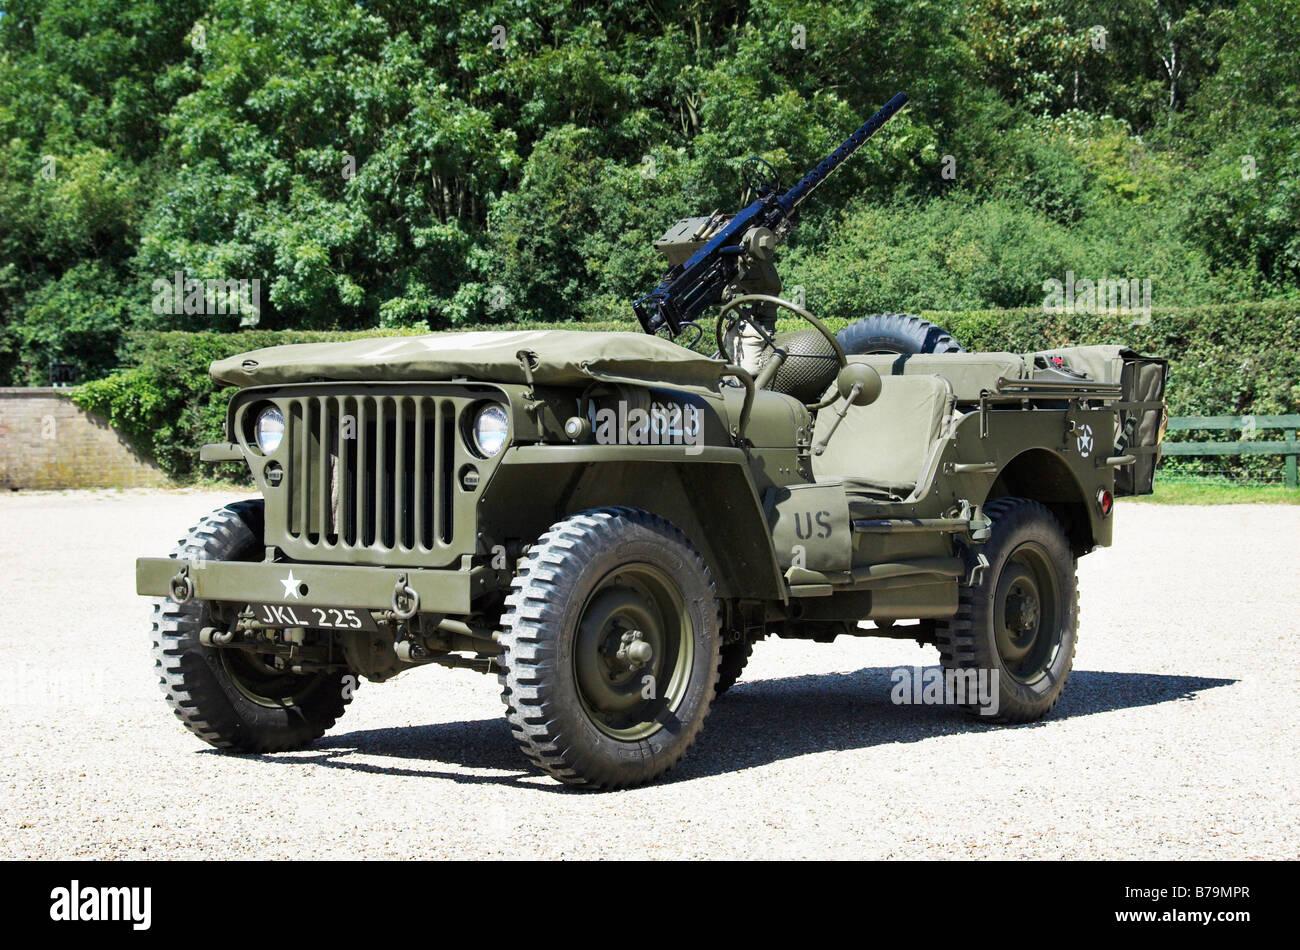 us army jeep stockfoto bild 21726847 alamy. Black Bedroom Furniture Sets. Home Design Ideas